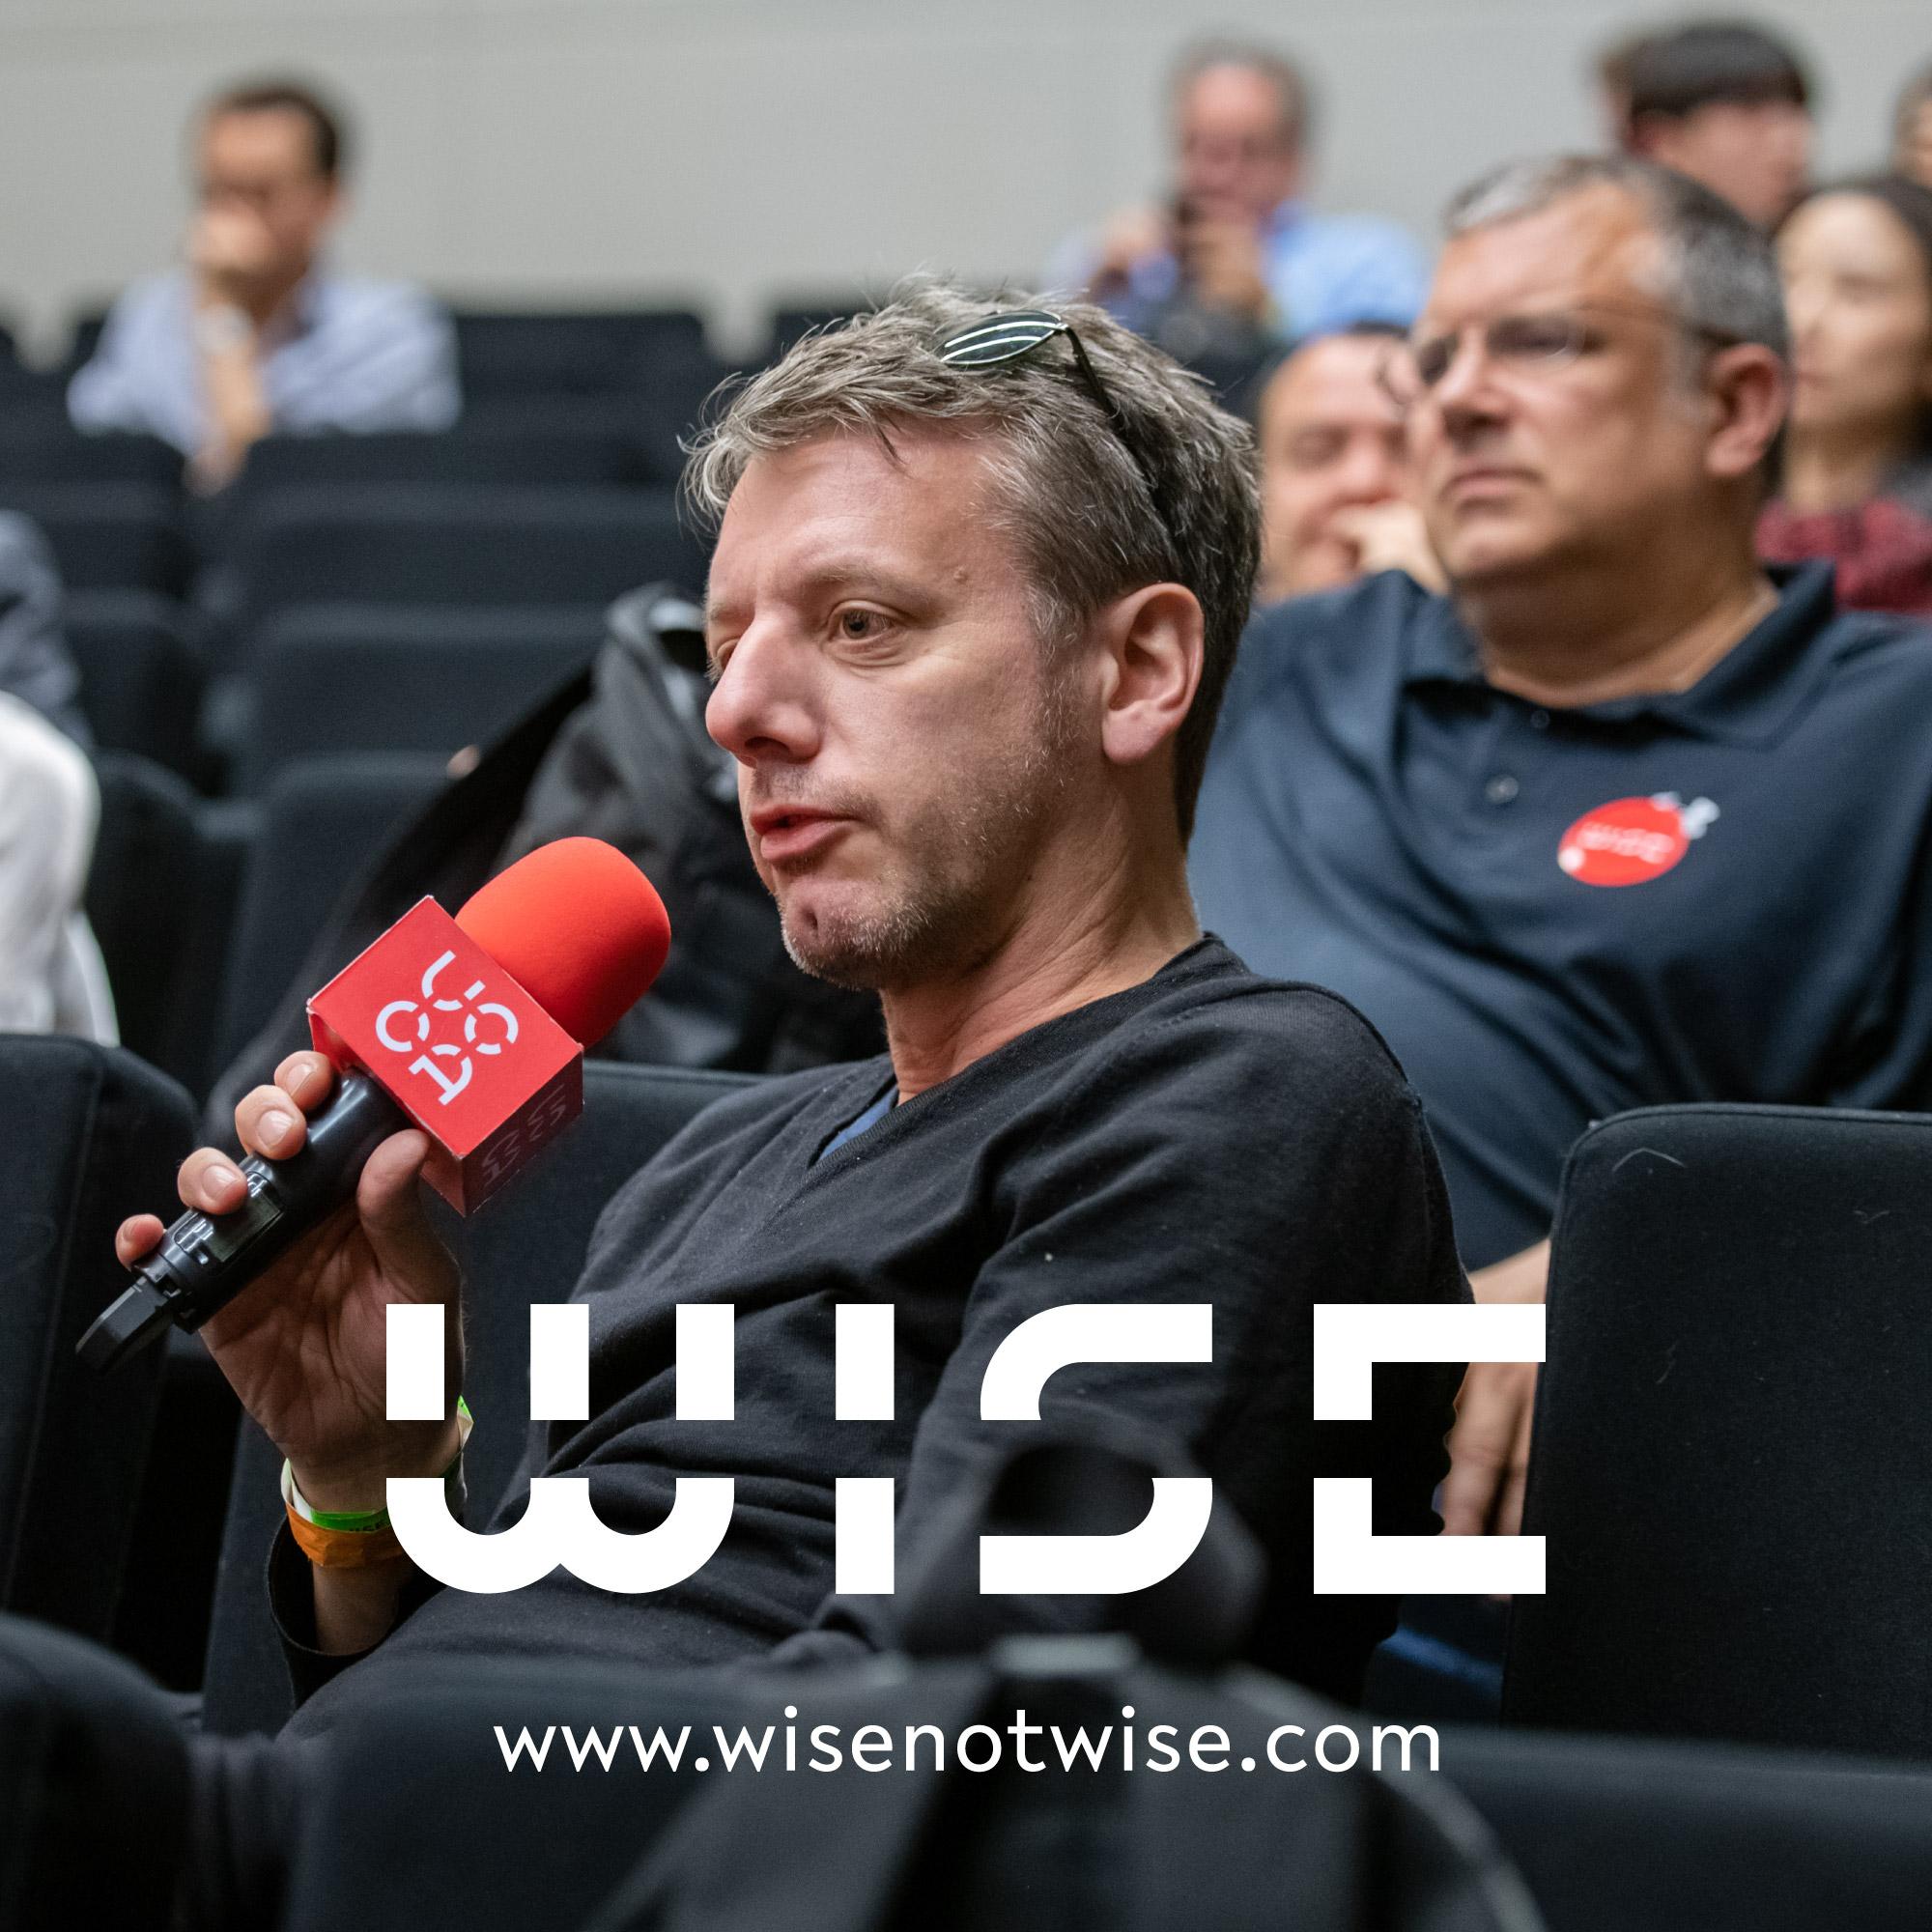 WISE_RECAP_2019_DAY_2_12.jpg